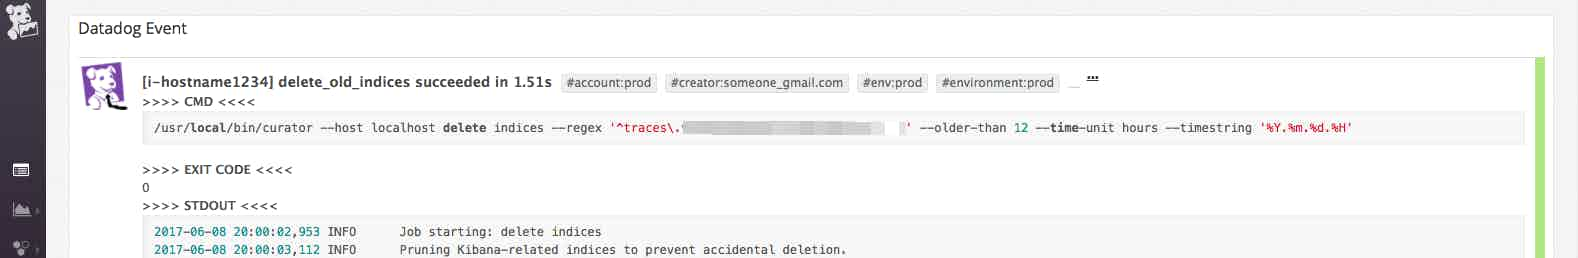 elasticsearch indices deleted event in Datadog event stream